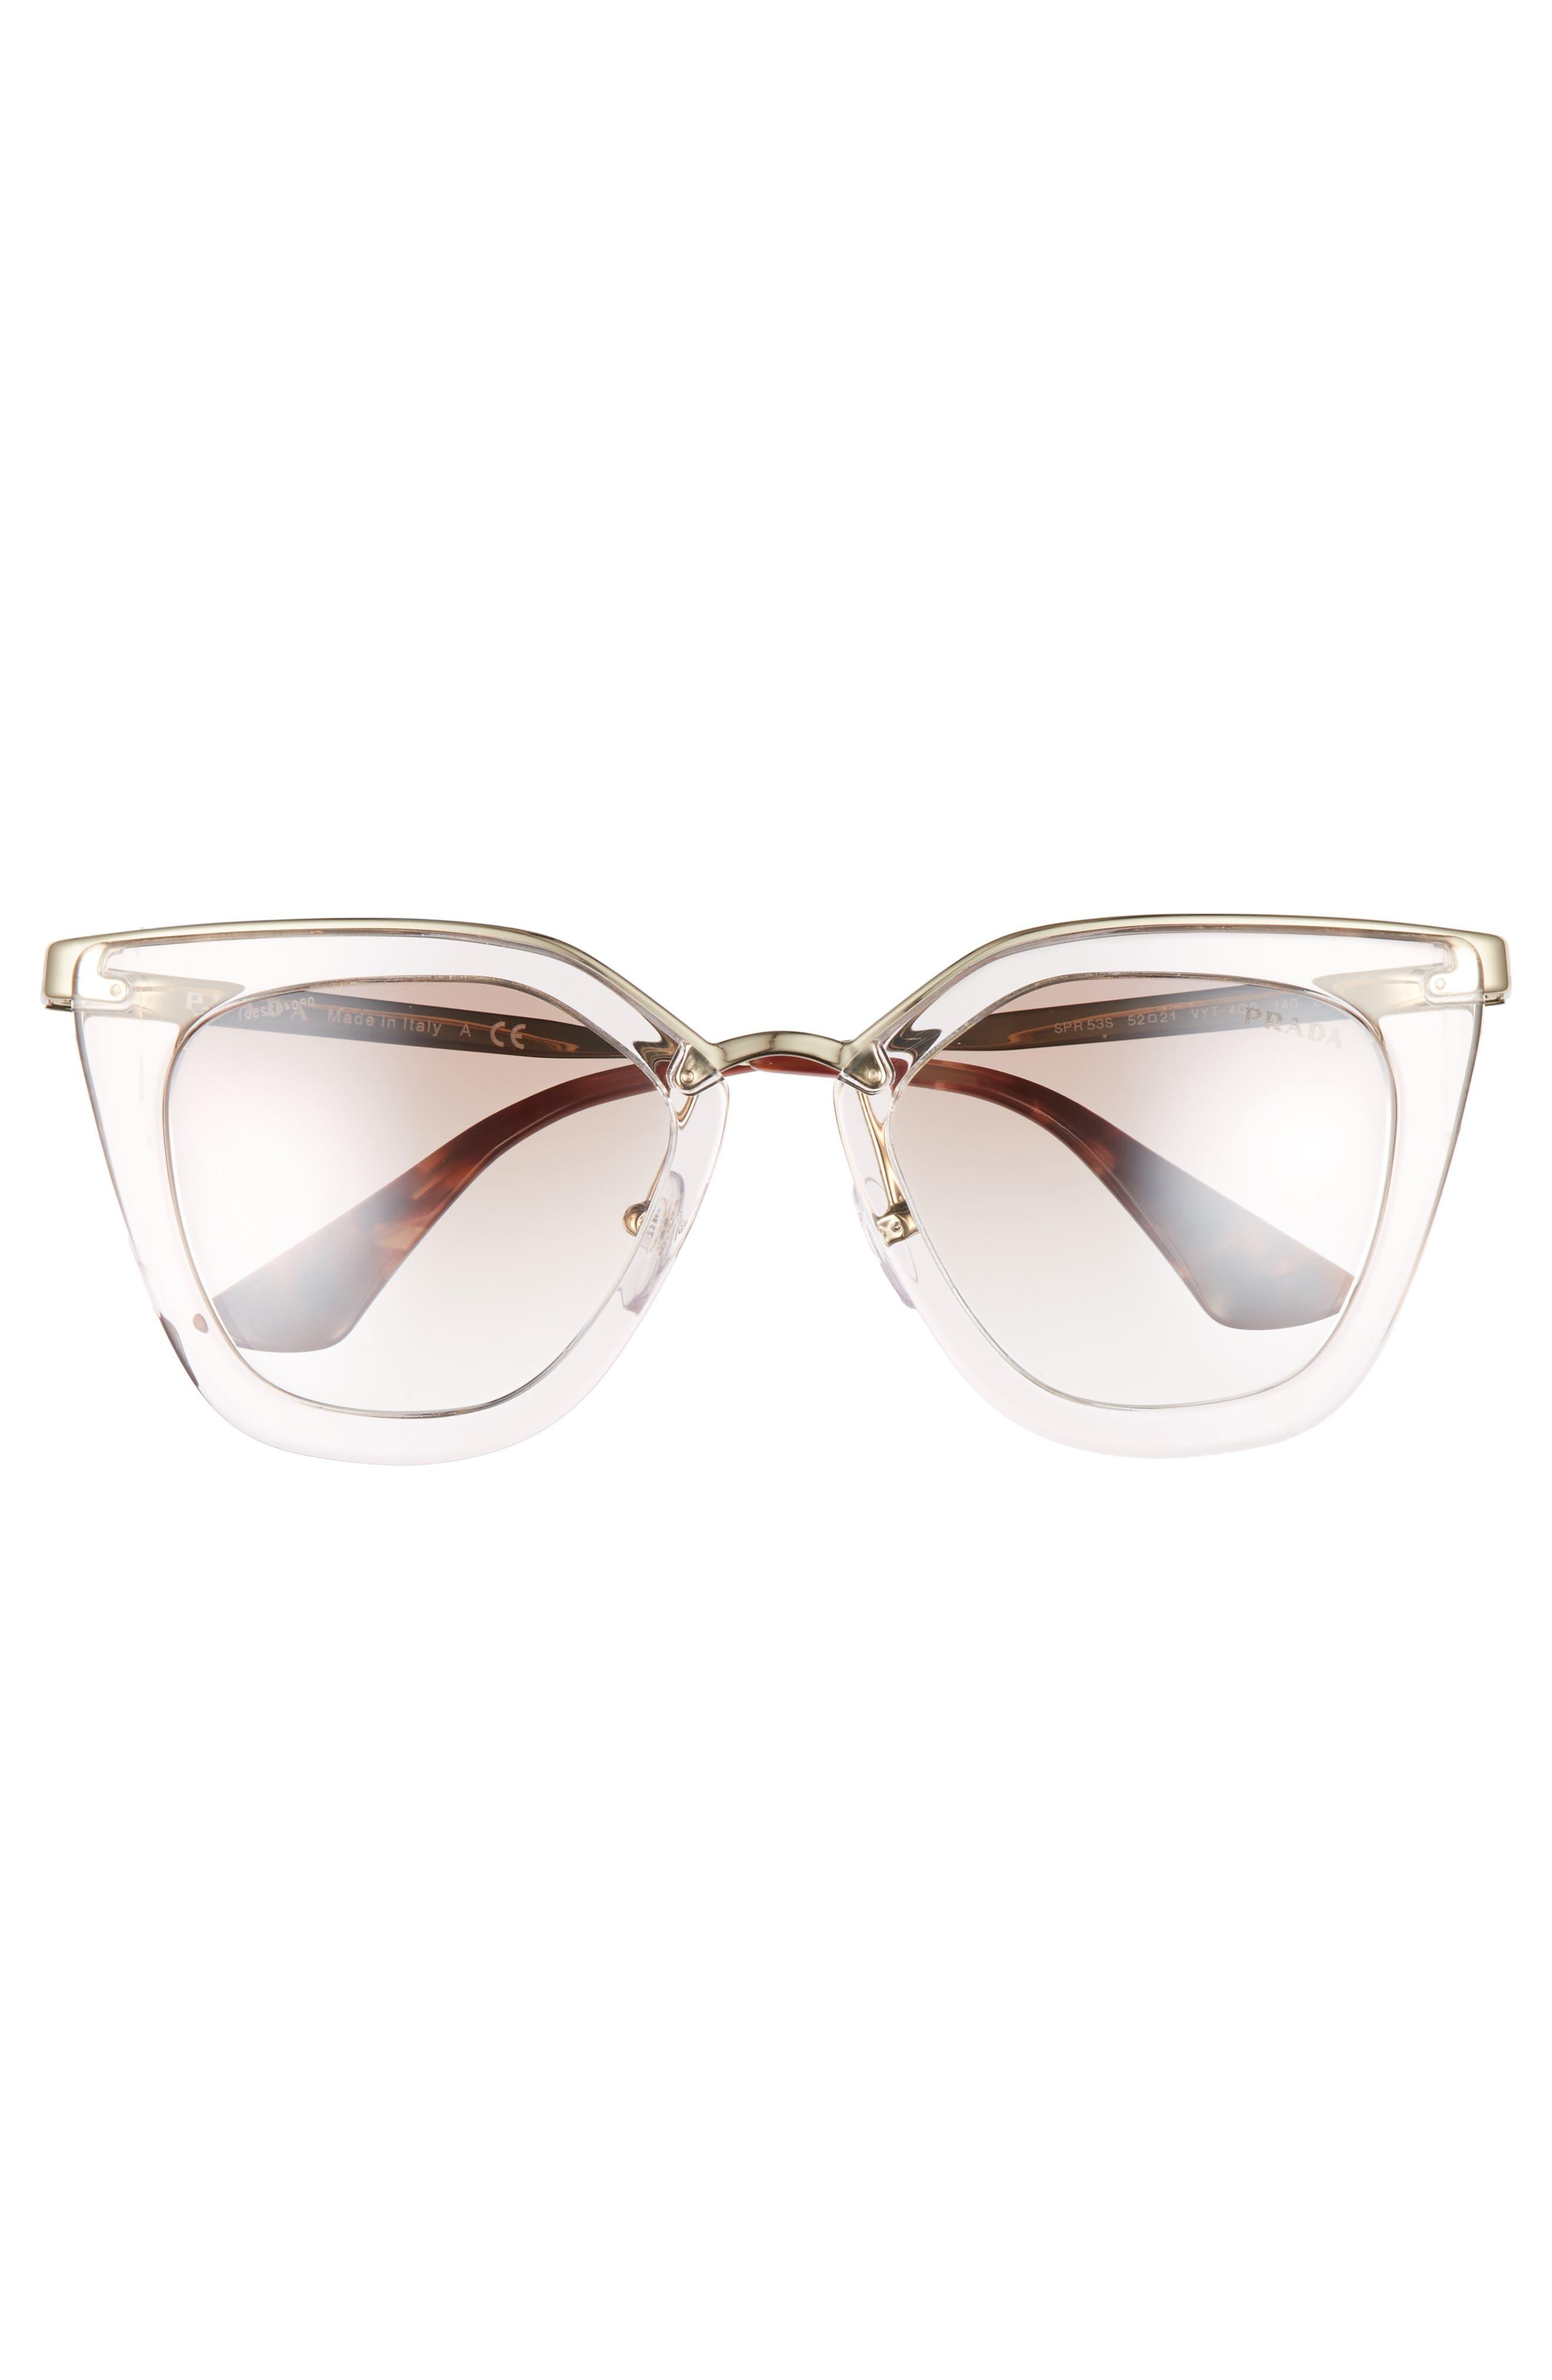 52mm Retro Sunglasses,                             Alternate thumbnail 4, color,                             200